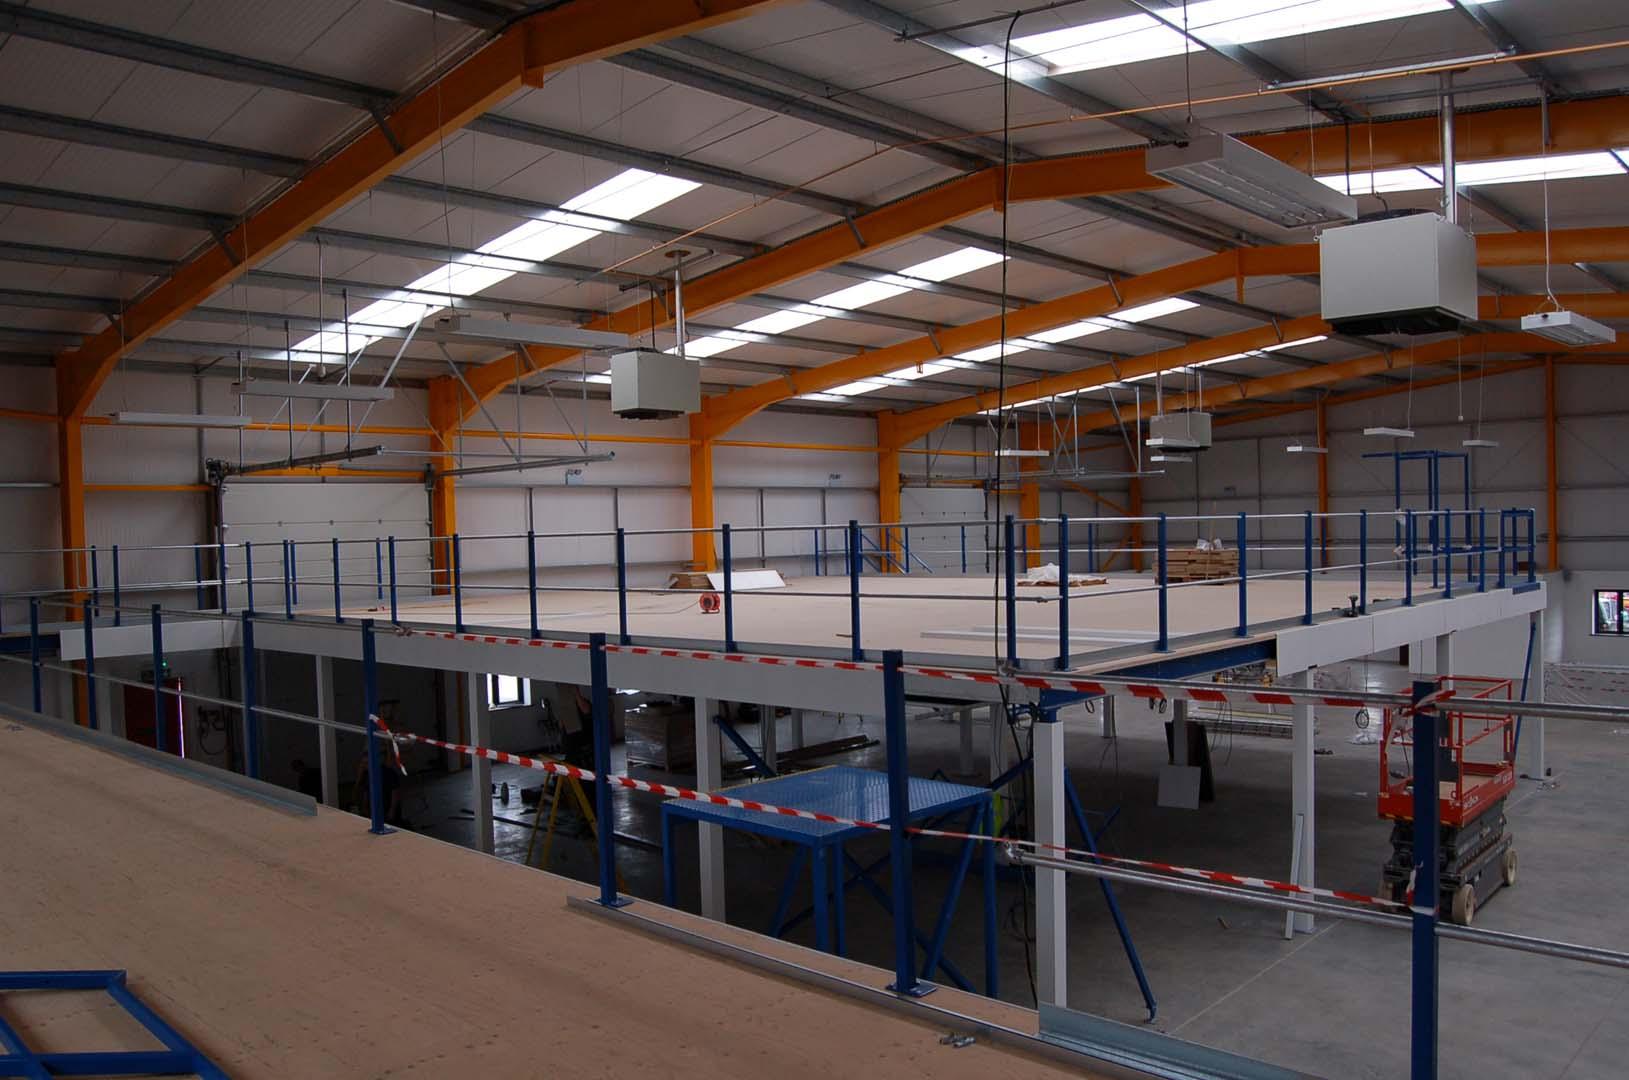 Mezzanine Installation company